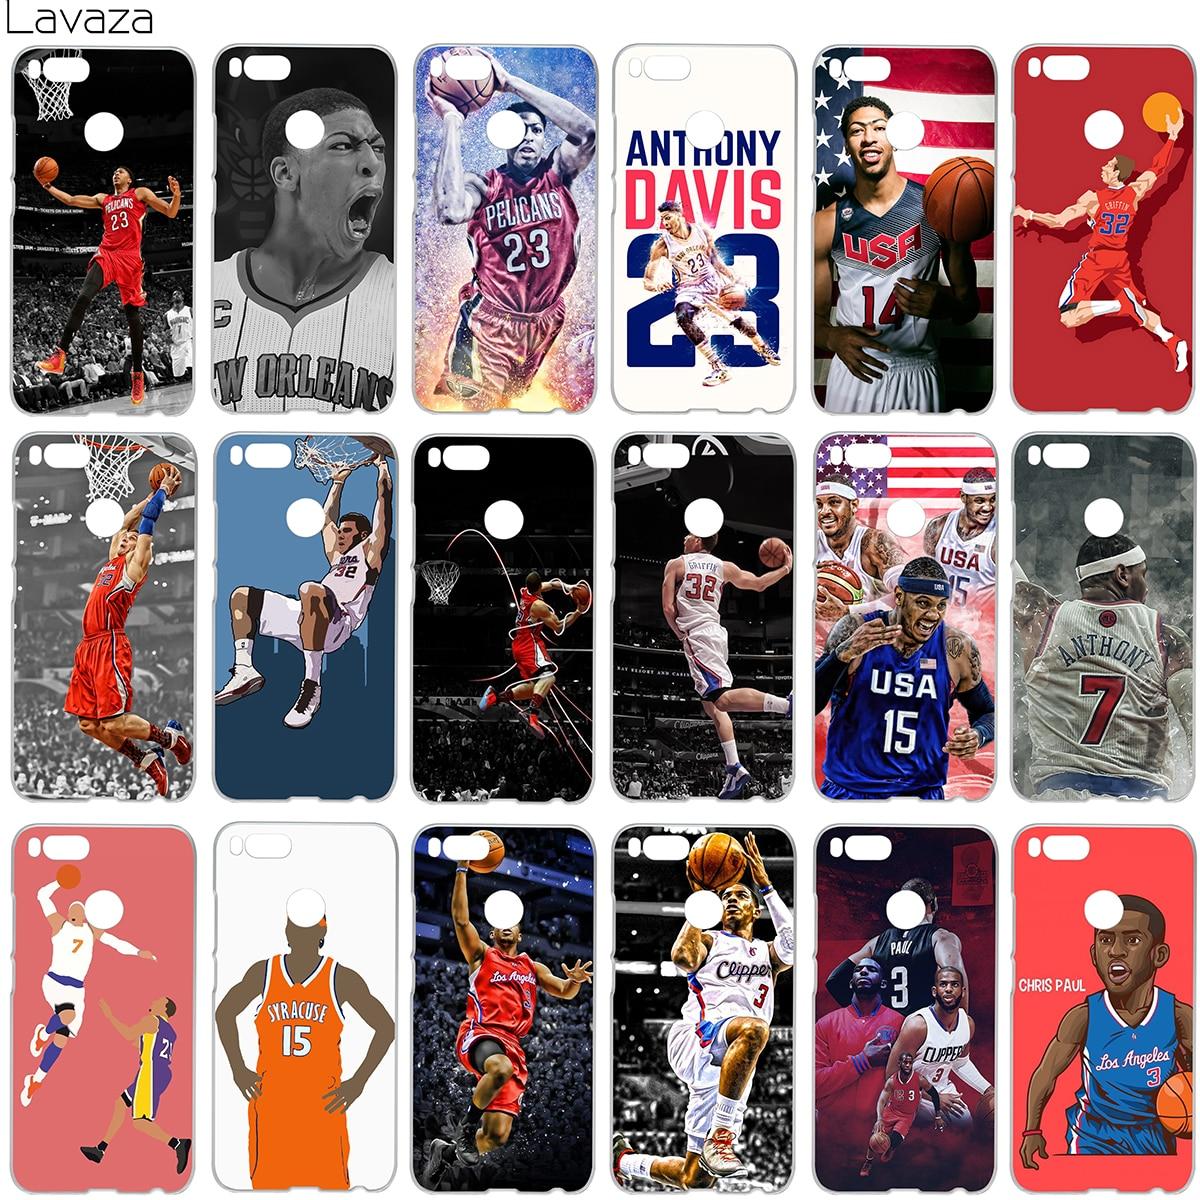 Lavaza Anthony Davis Blake Carmelo Anthony Chris Paul Case for Xiaomi Redmi Note 4X MI A1 4 5 6 Plus 4A MI6 Pro 5A